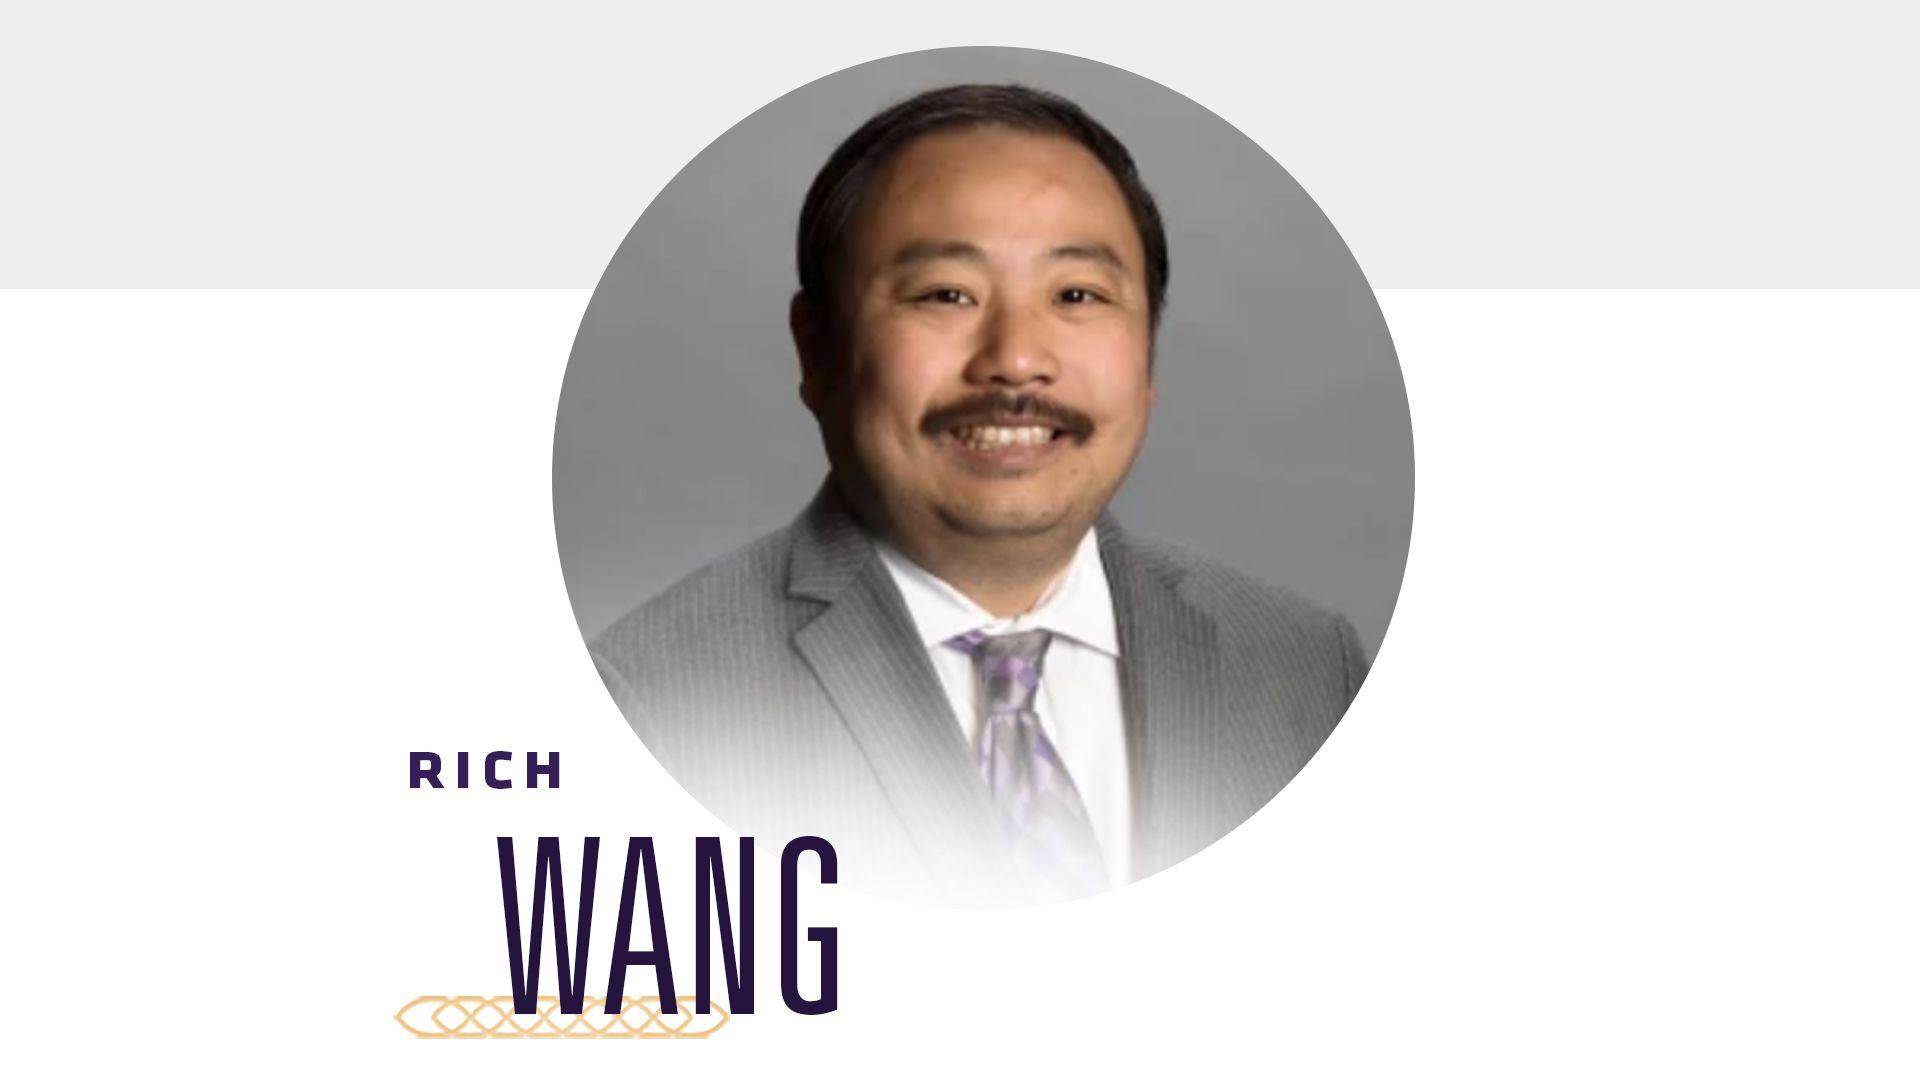 Rich Wang, Director of Analytics and Engagement, Minnesota Vikings